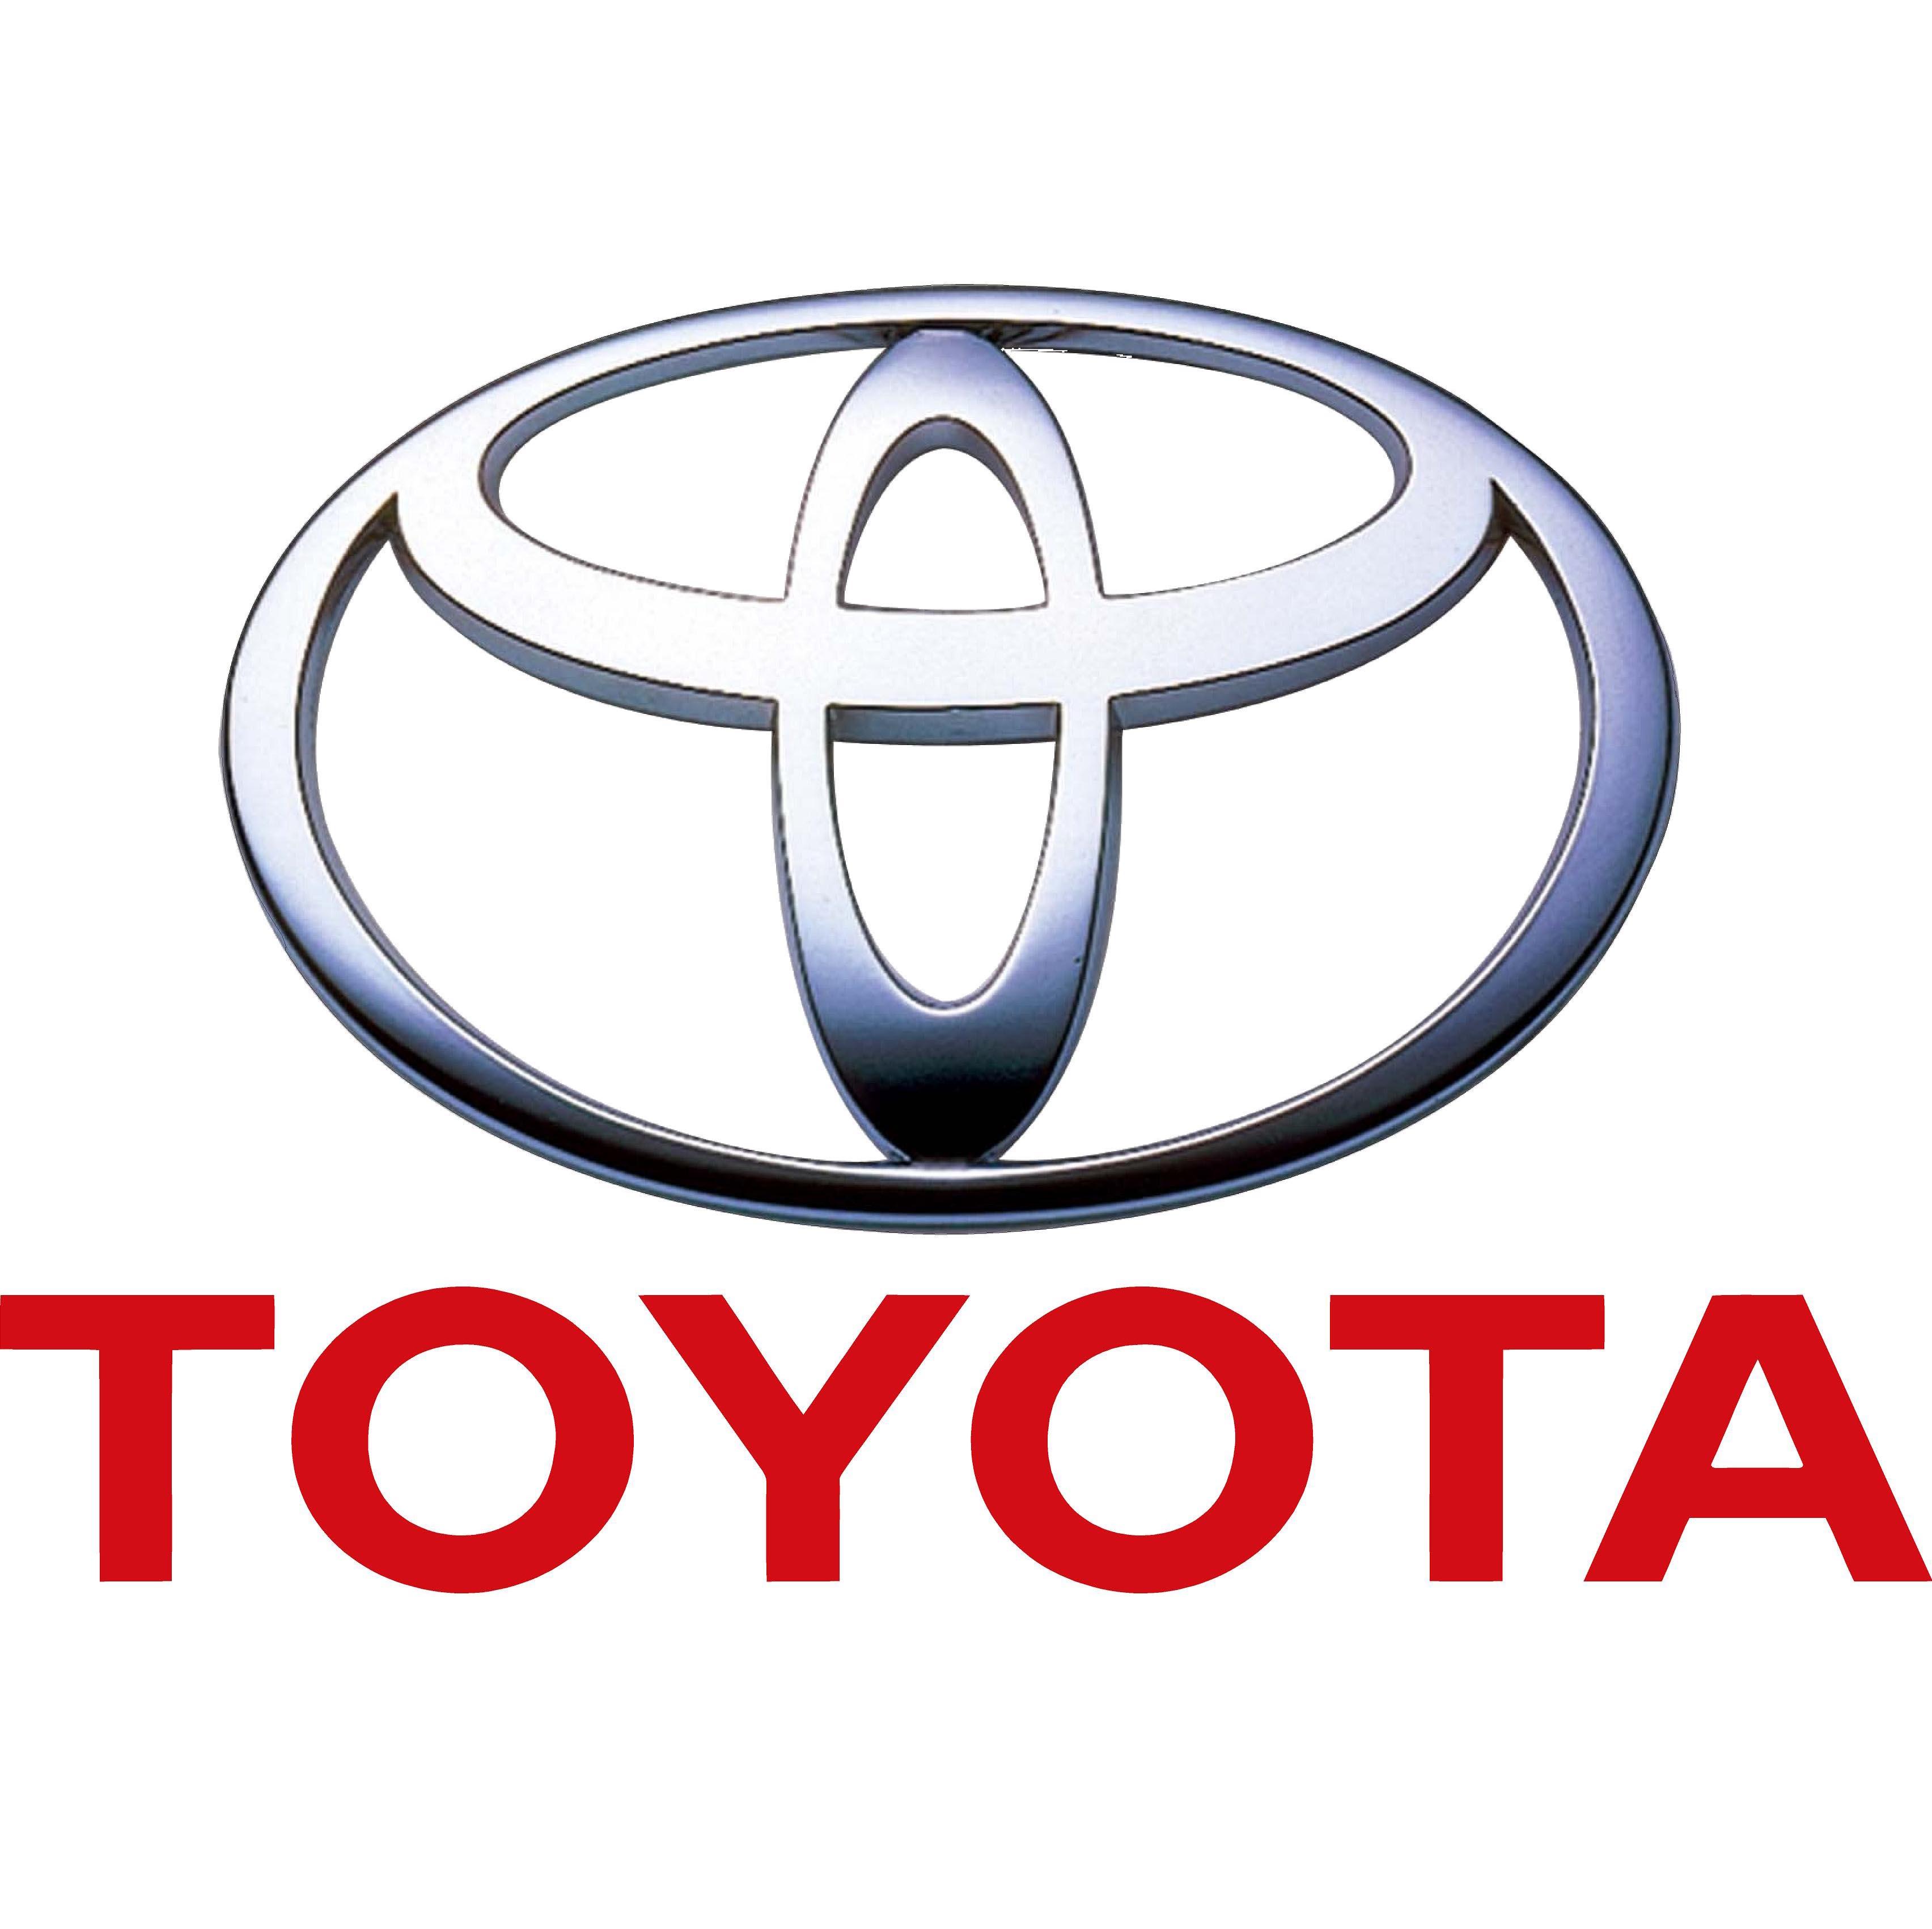 Toyota Symbol - Toyota Logo PNG